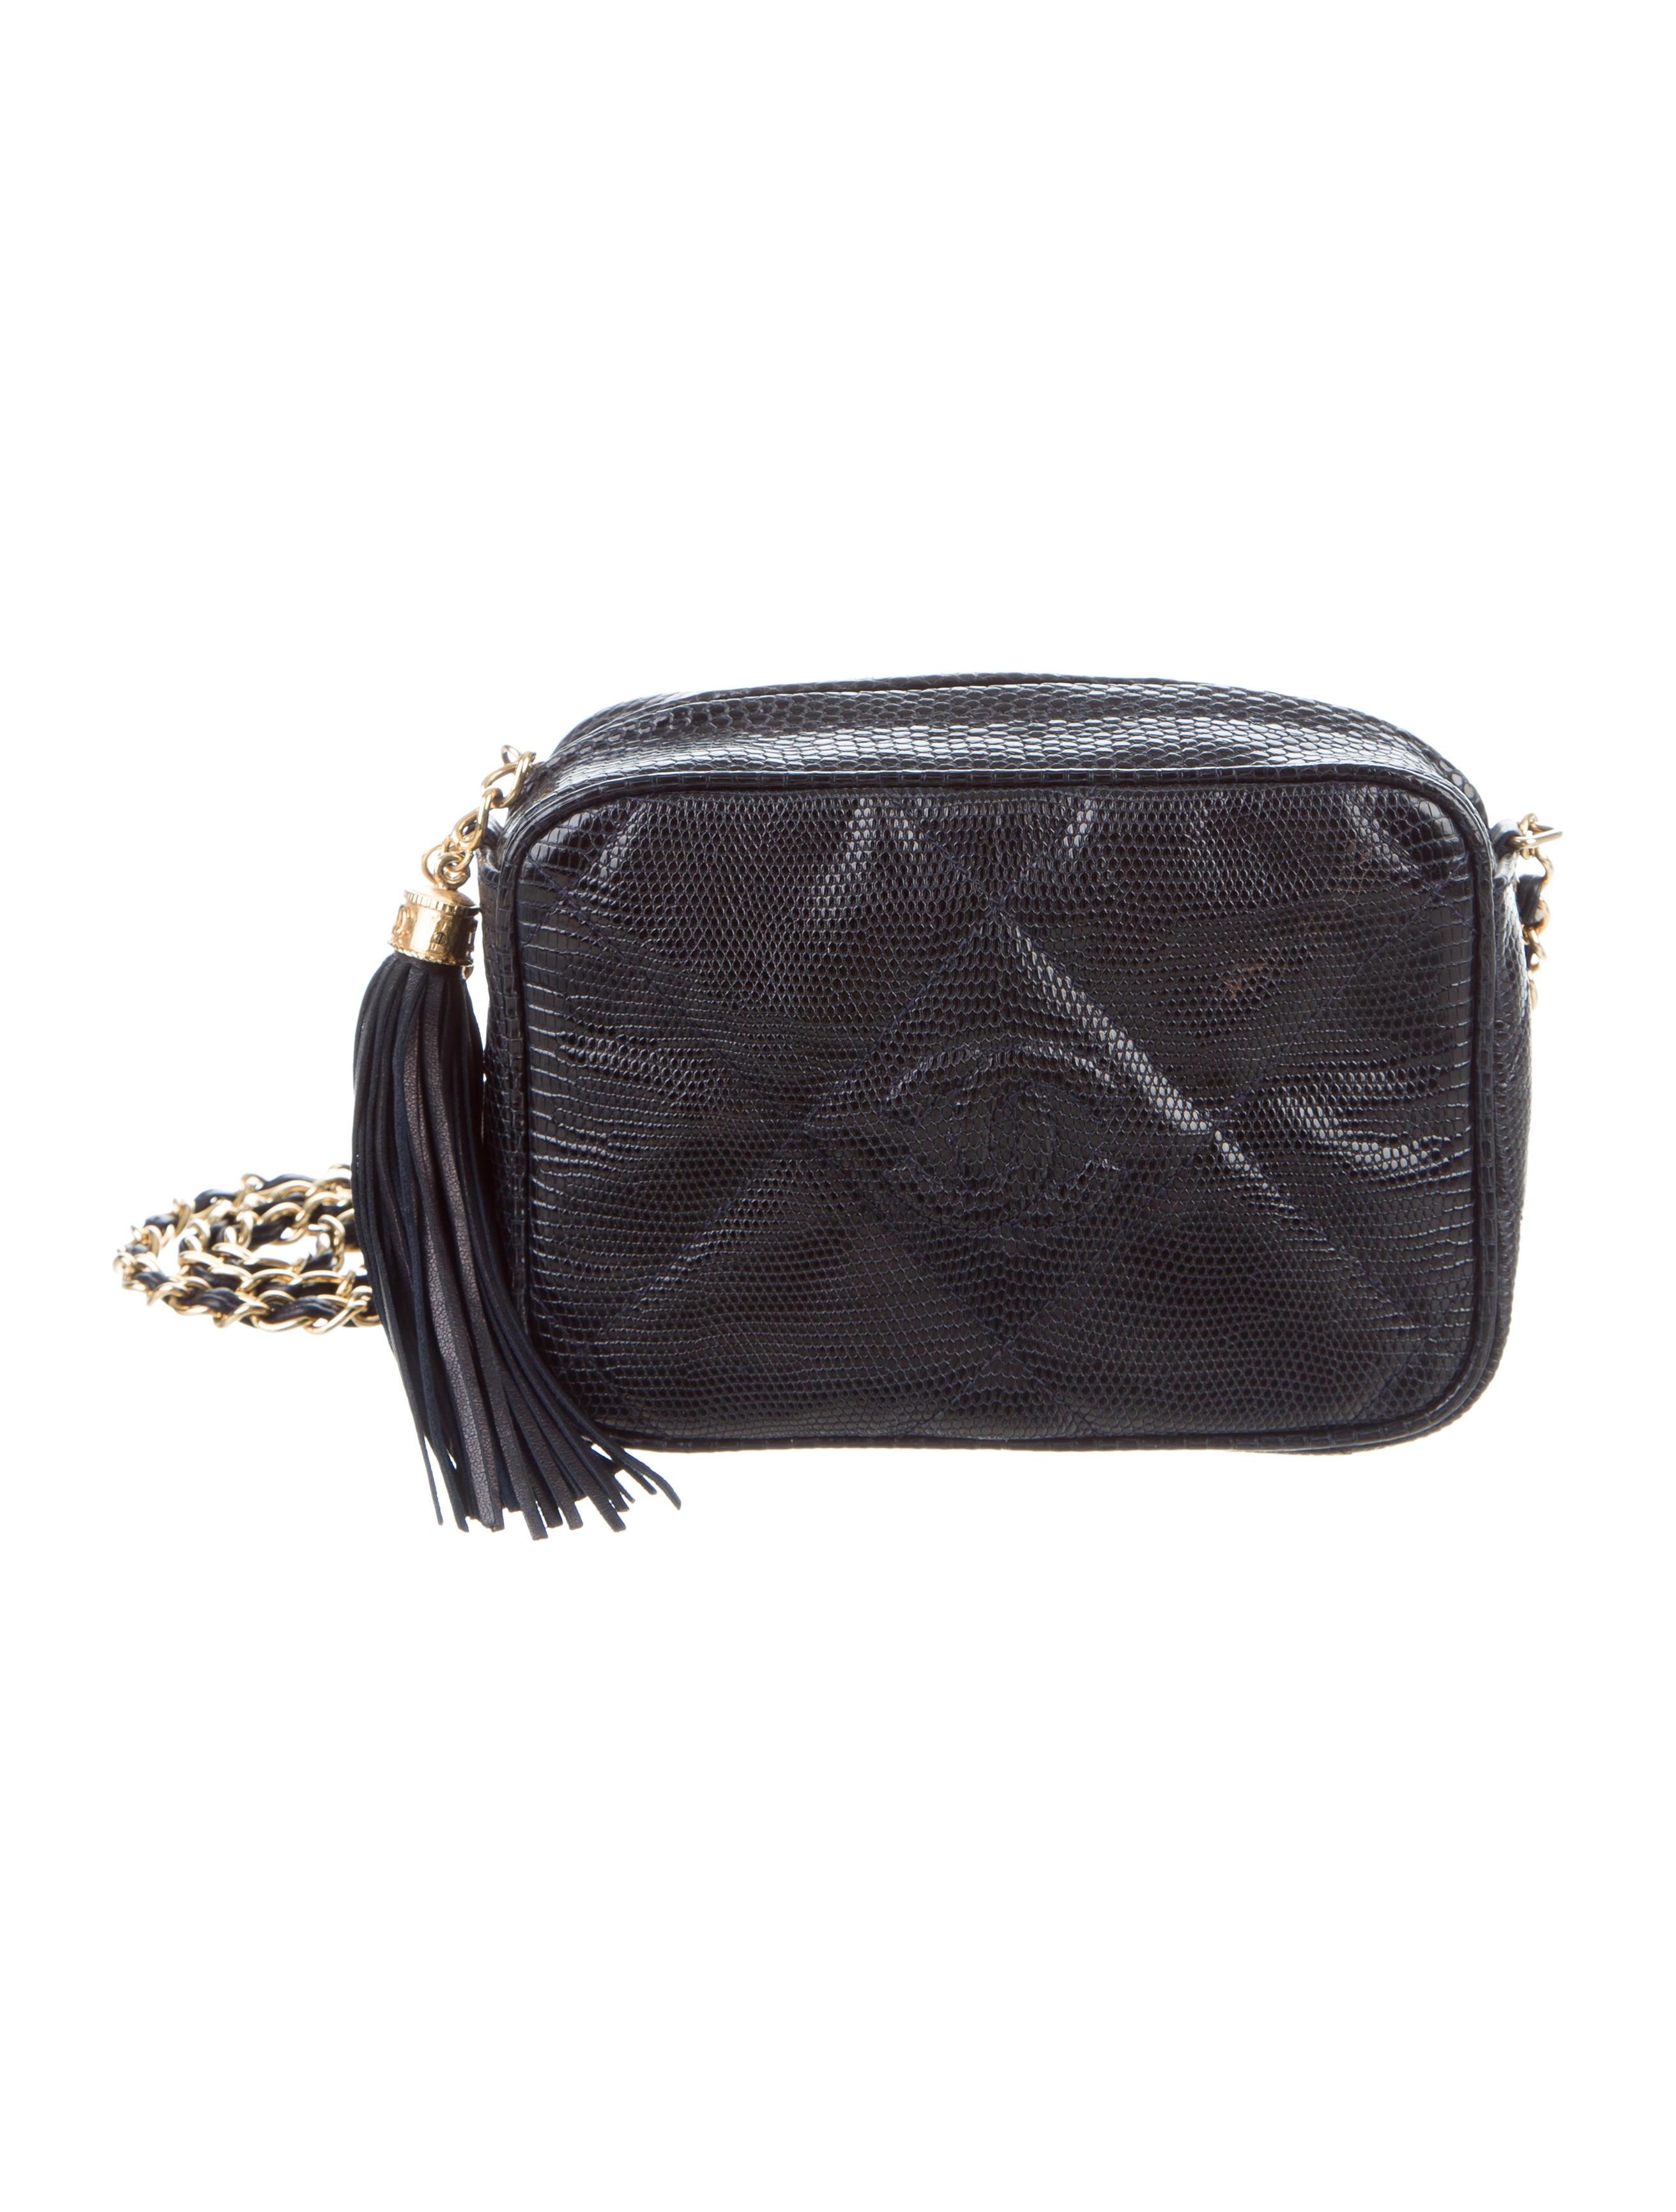 Chanel Väskor Vintage : Chanel vintage lizard mini camera bag handbags